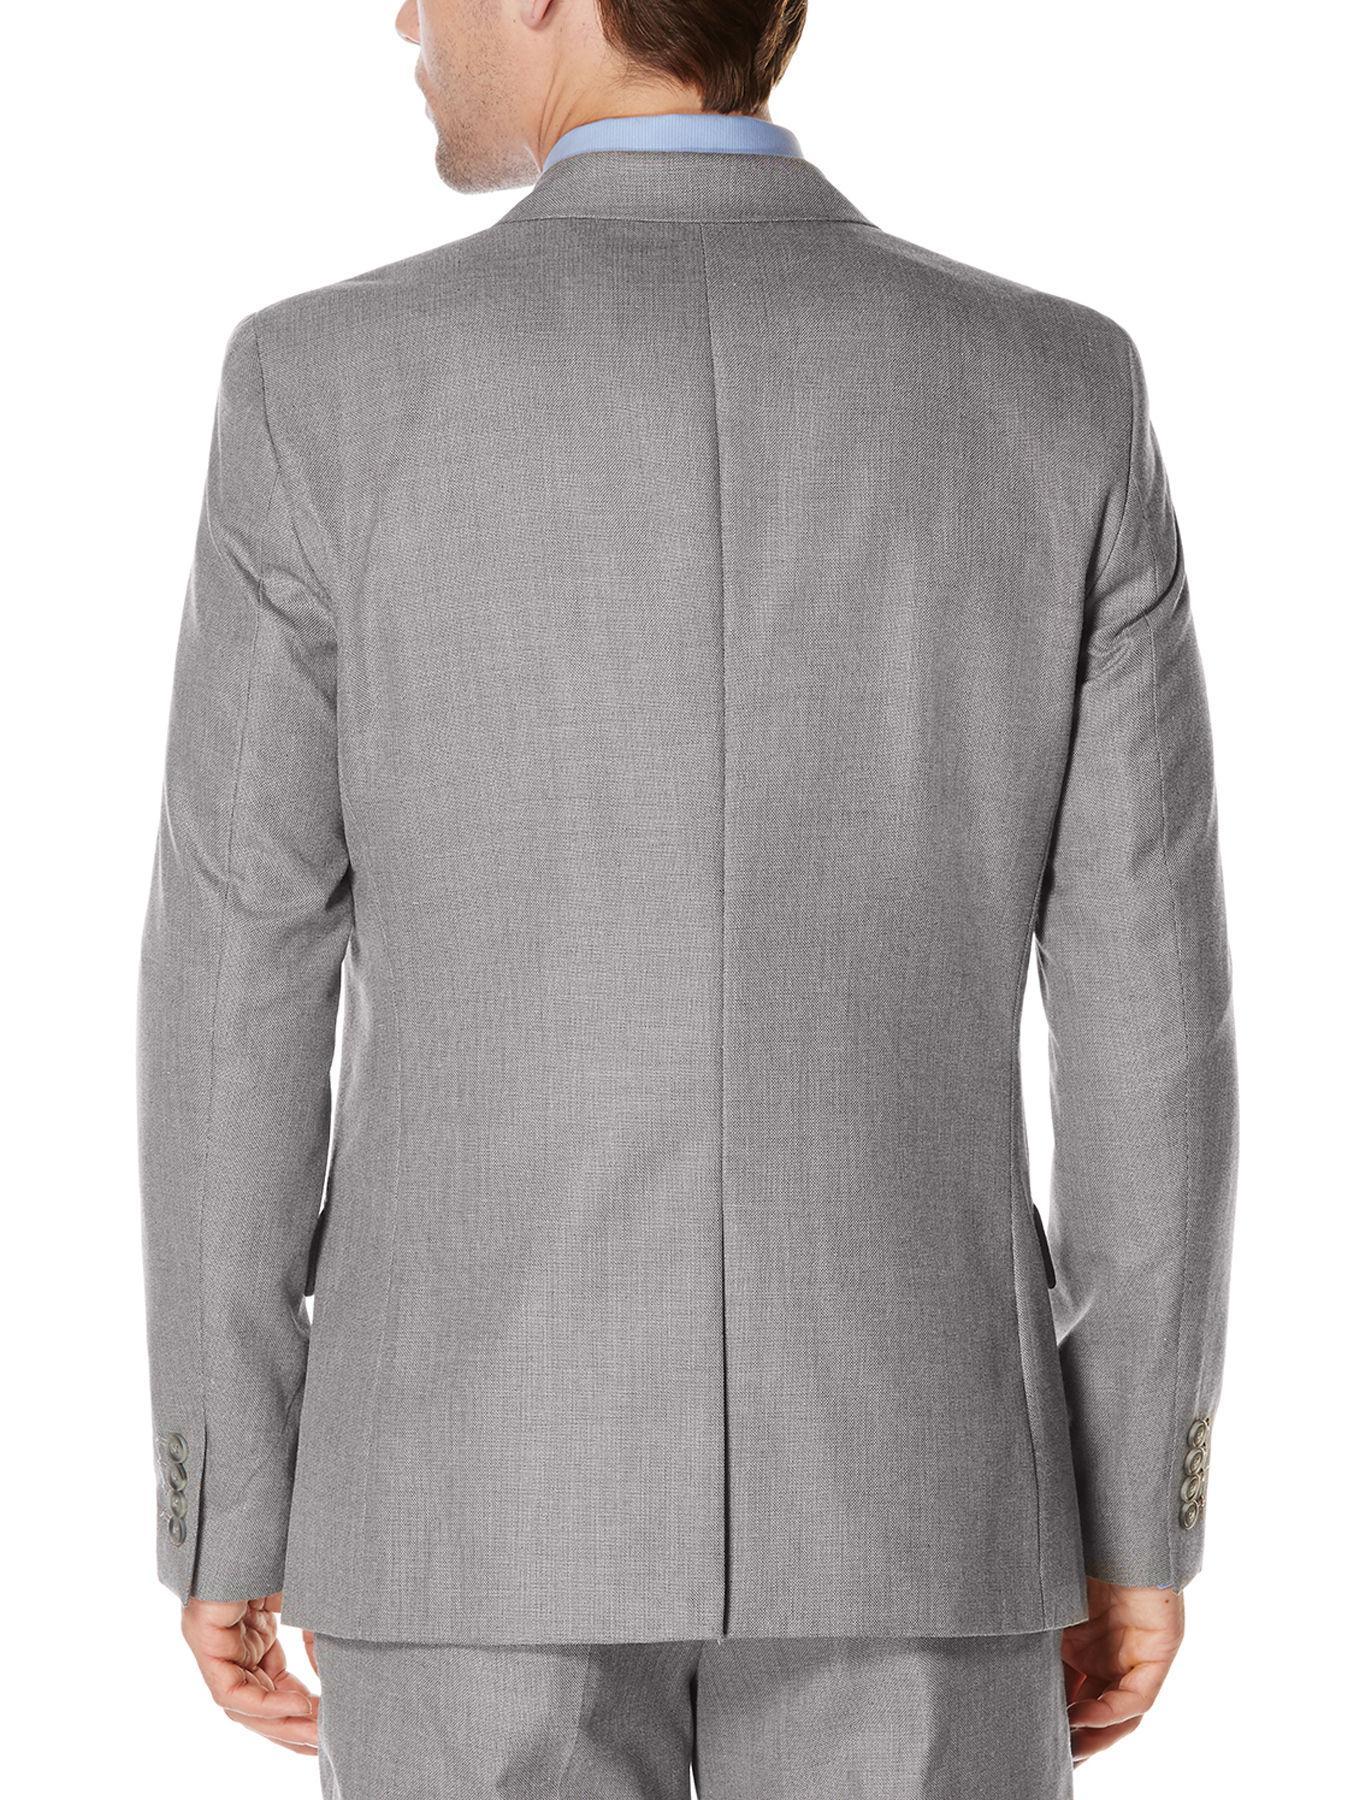 62ac028160 Perry Ellis - Gray Slim Fit Twill Grey Suit Jacket for Men - Lyst. View  fullscreen